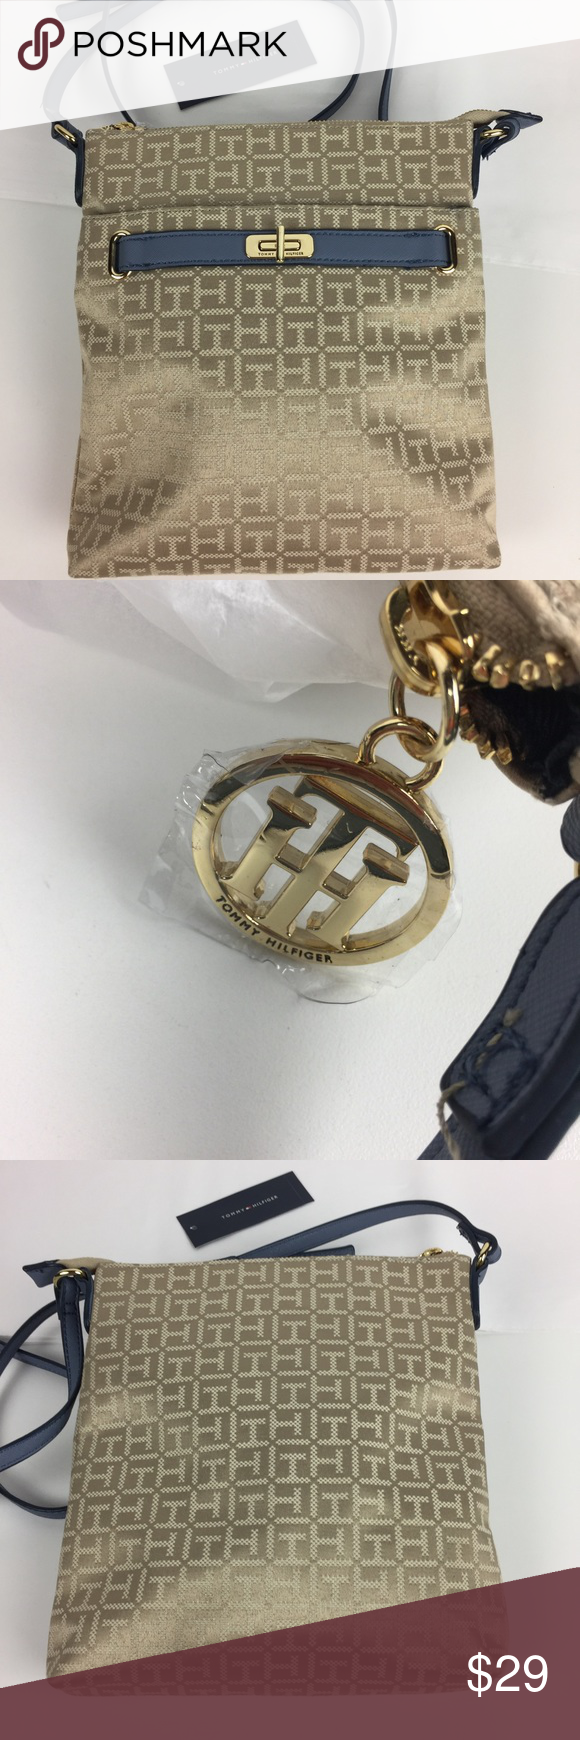 Spotted while shopping on Poshmark: Tommy Hilfiger Helen Monogram Jacquard Crossbody! #poshmark #fashion #shopping #style #Tommy Hilfiger #Handbags